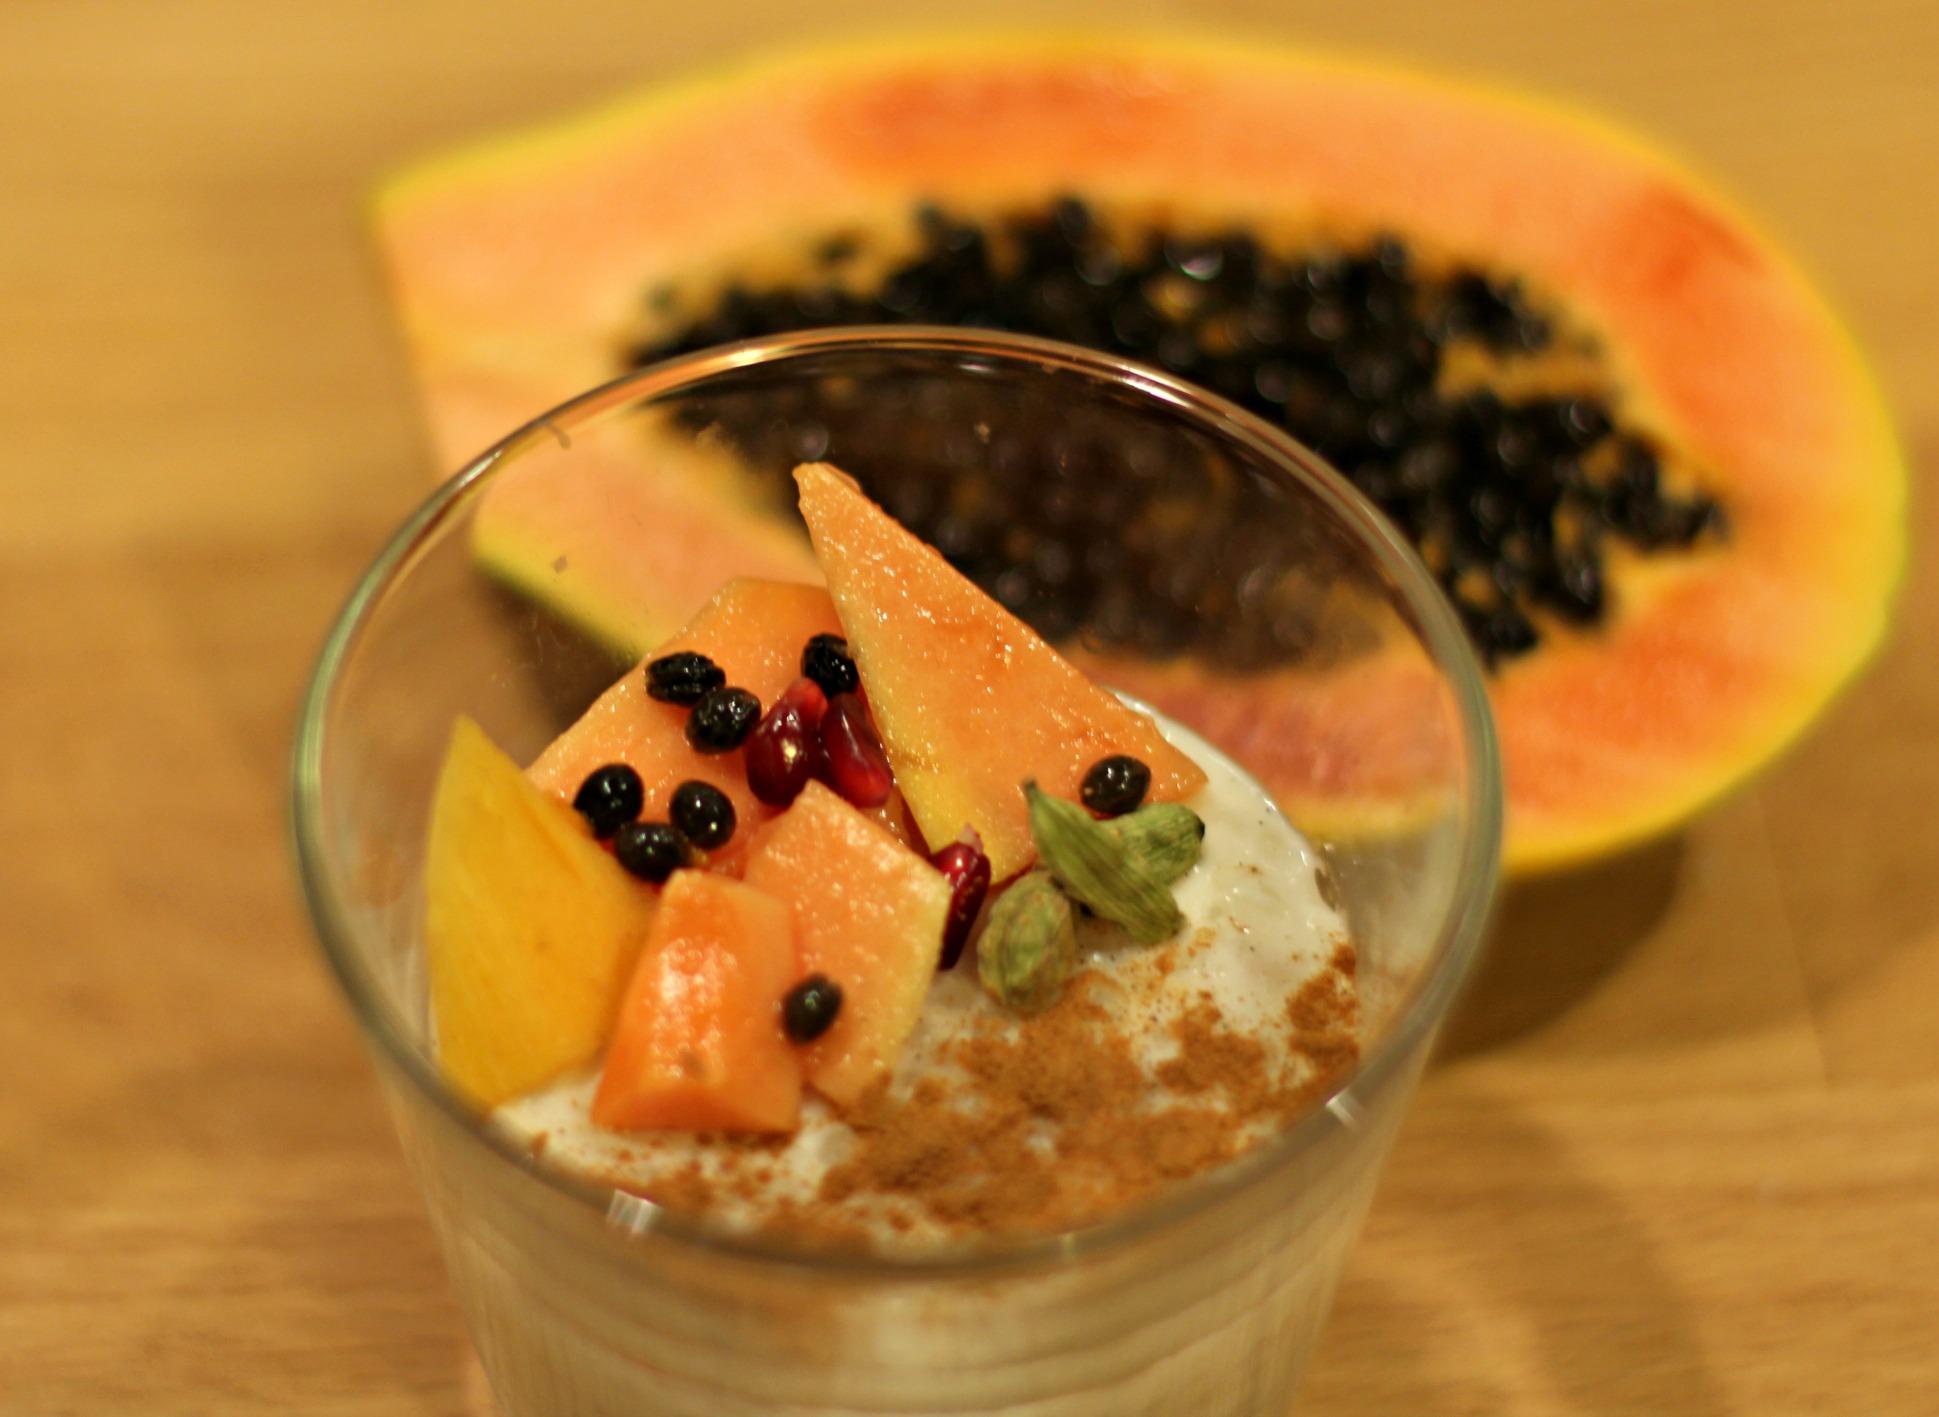 Kokosmilchpudding mit Tapiokaperlen und Papaya